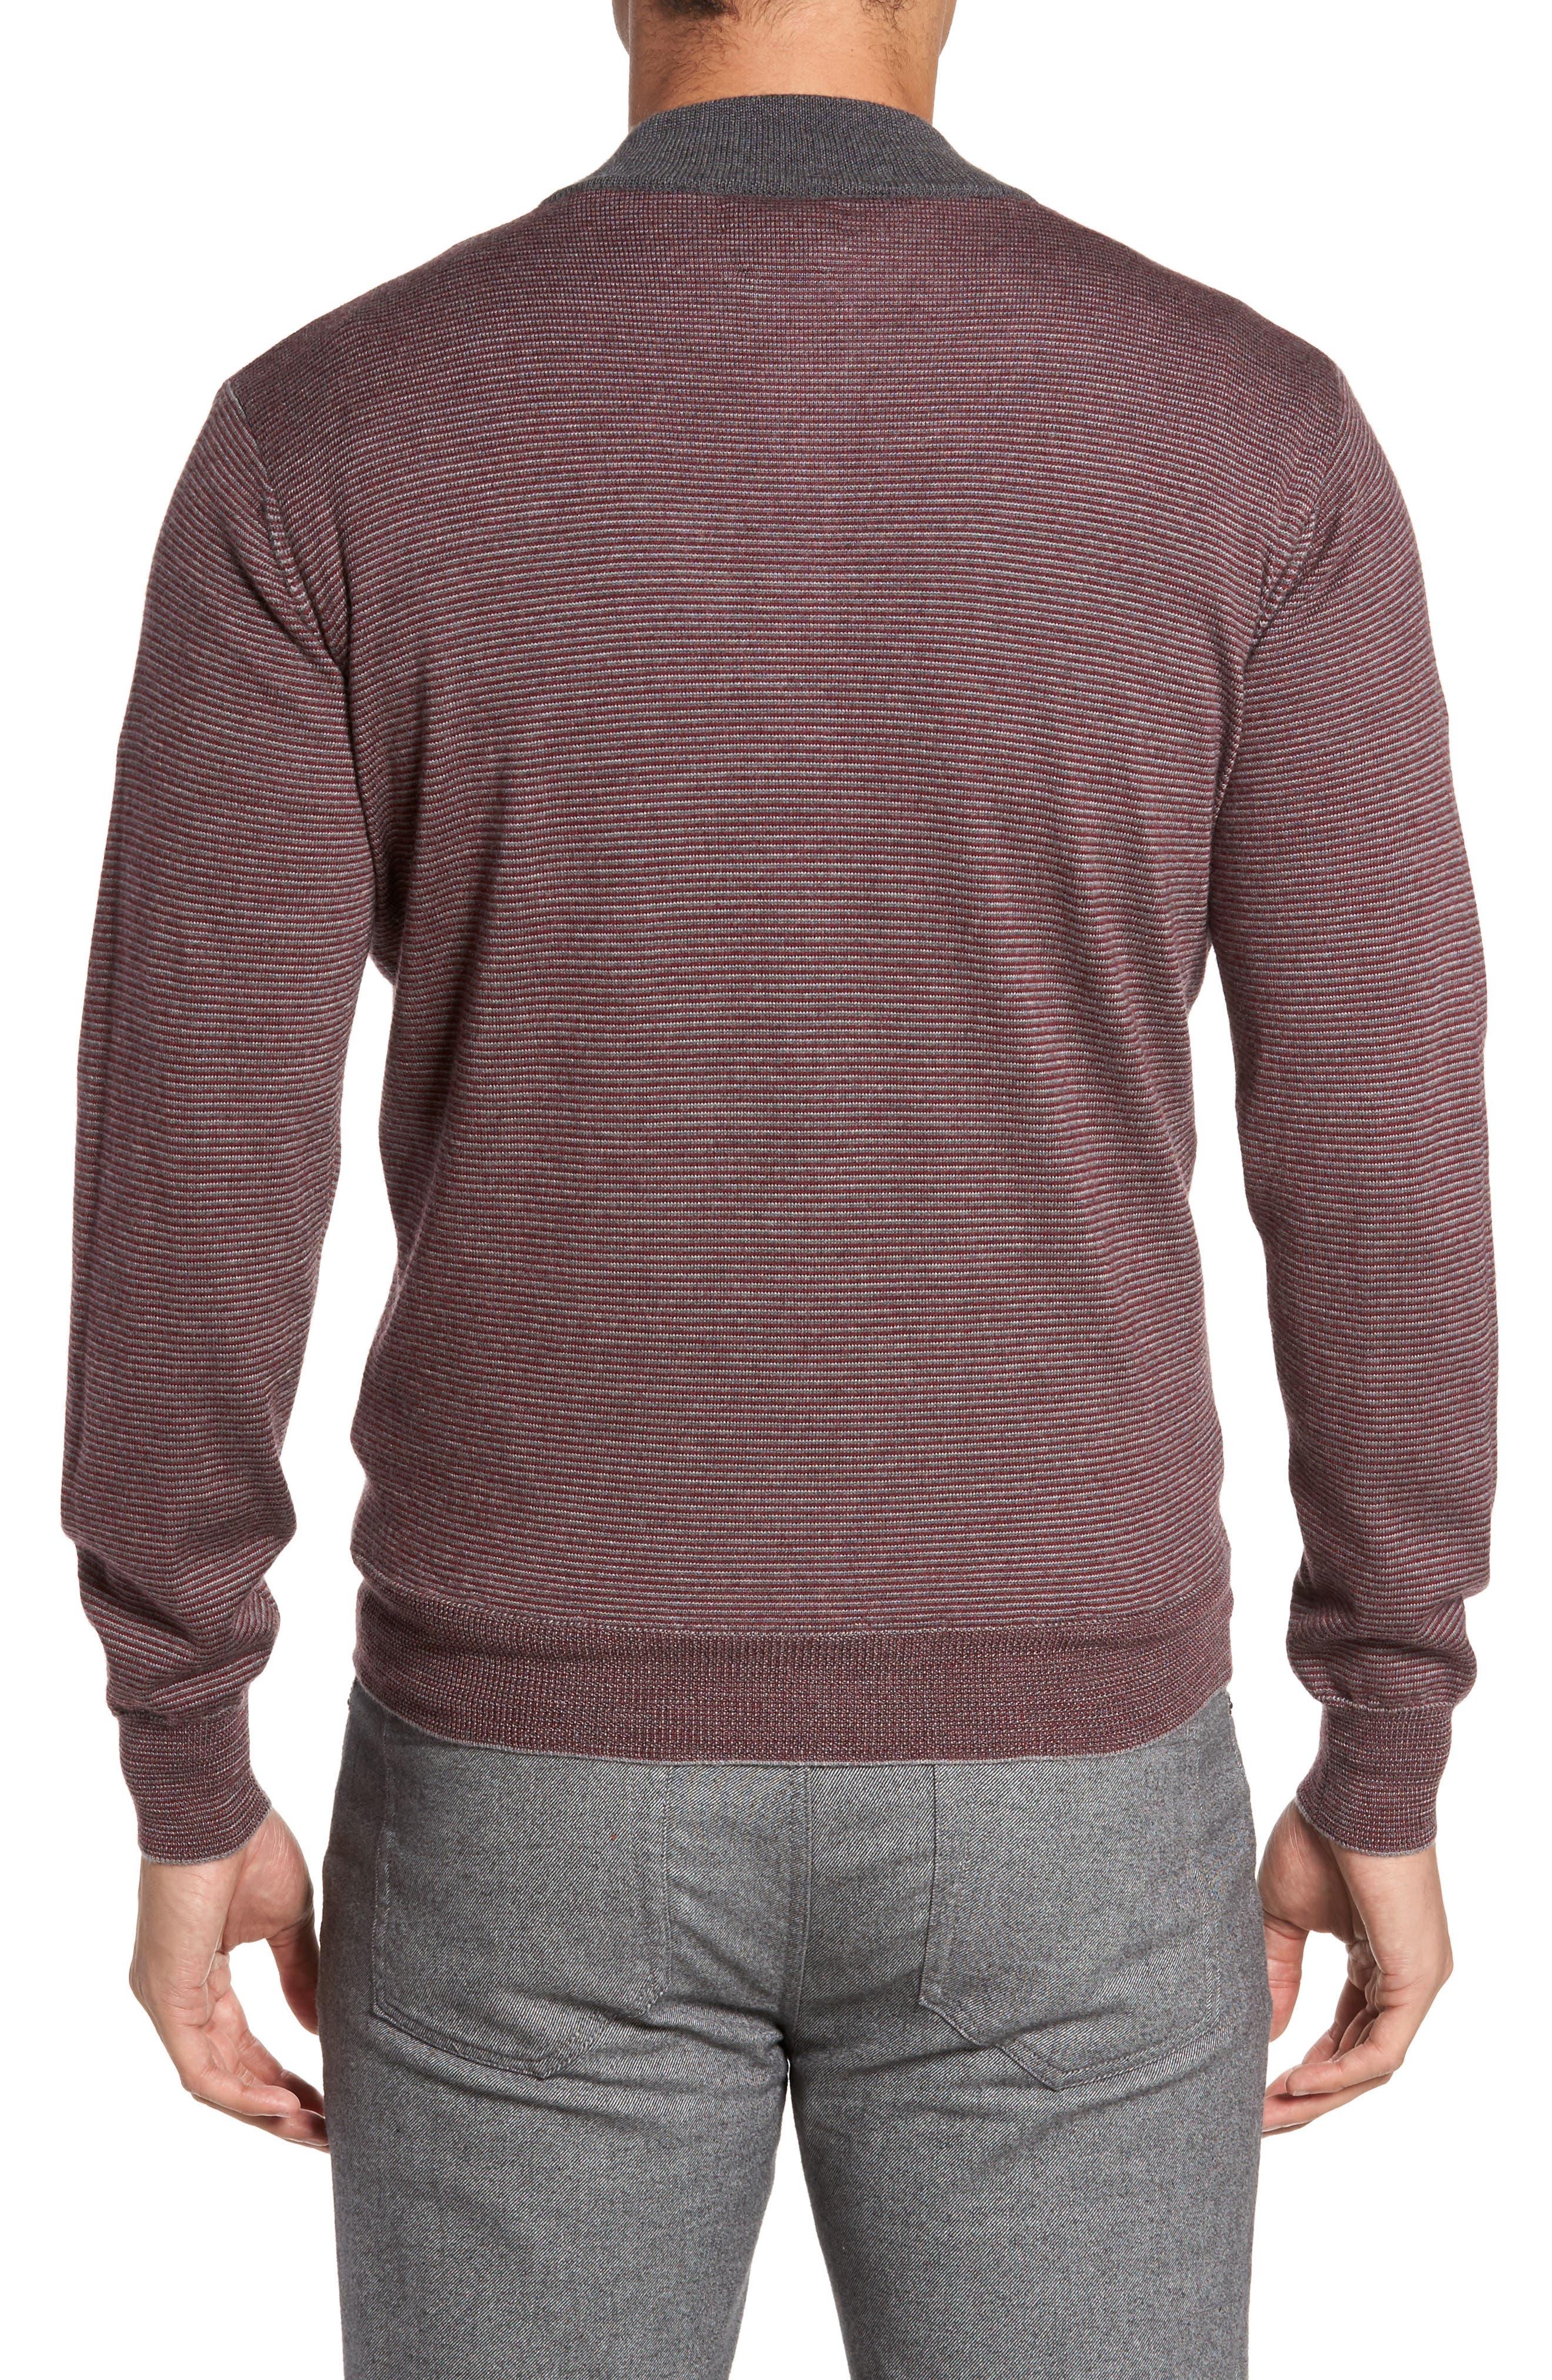 Trichrome Stripe Merino Wool Blend Sweater,                             Alternate thumbnail 2, color,                             Chianti